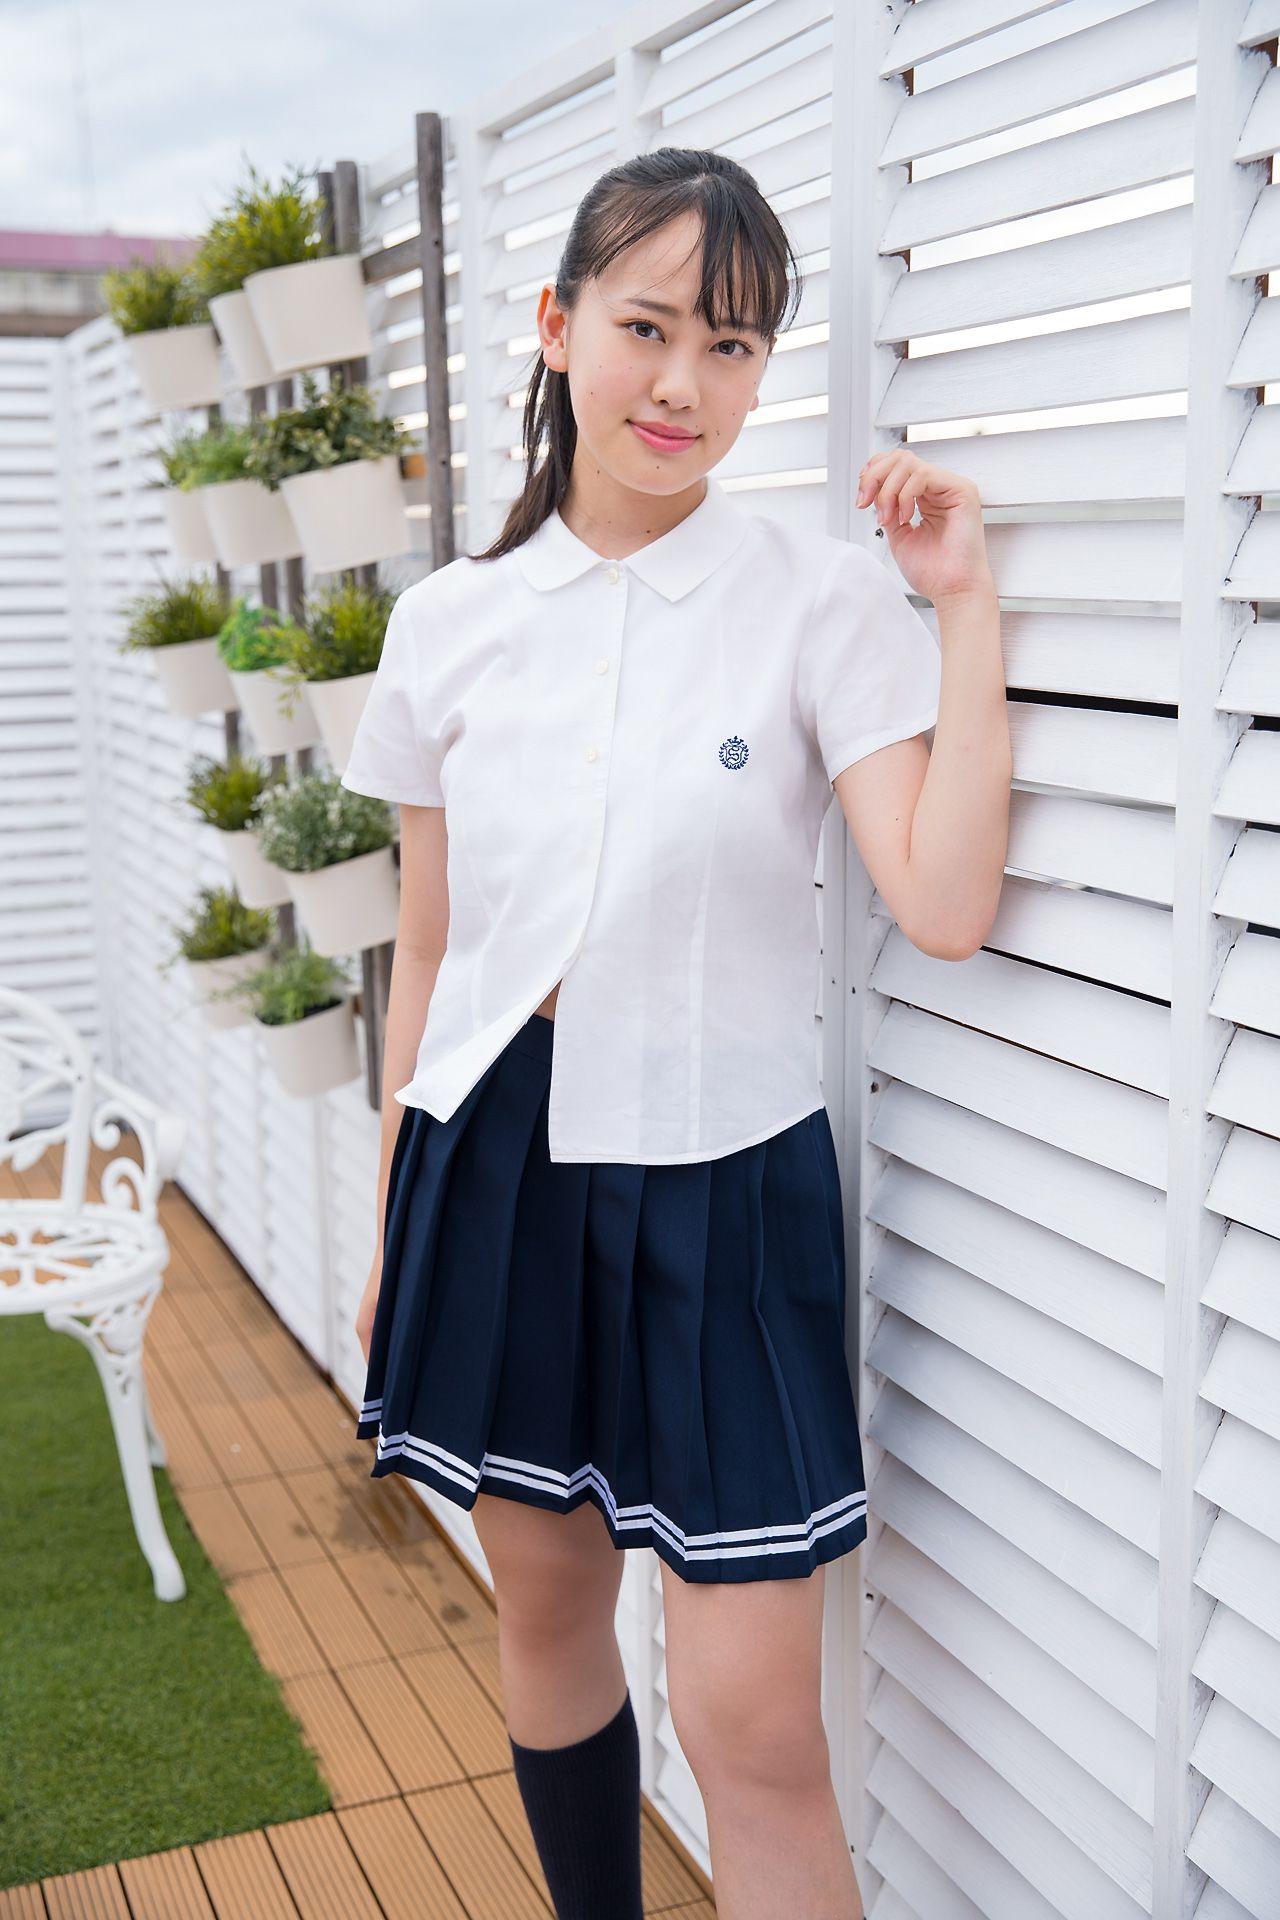 VOL.525 [Minisuka.tv]校服清纯少女:柏木さりな超高清写真套图(45P)